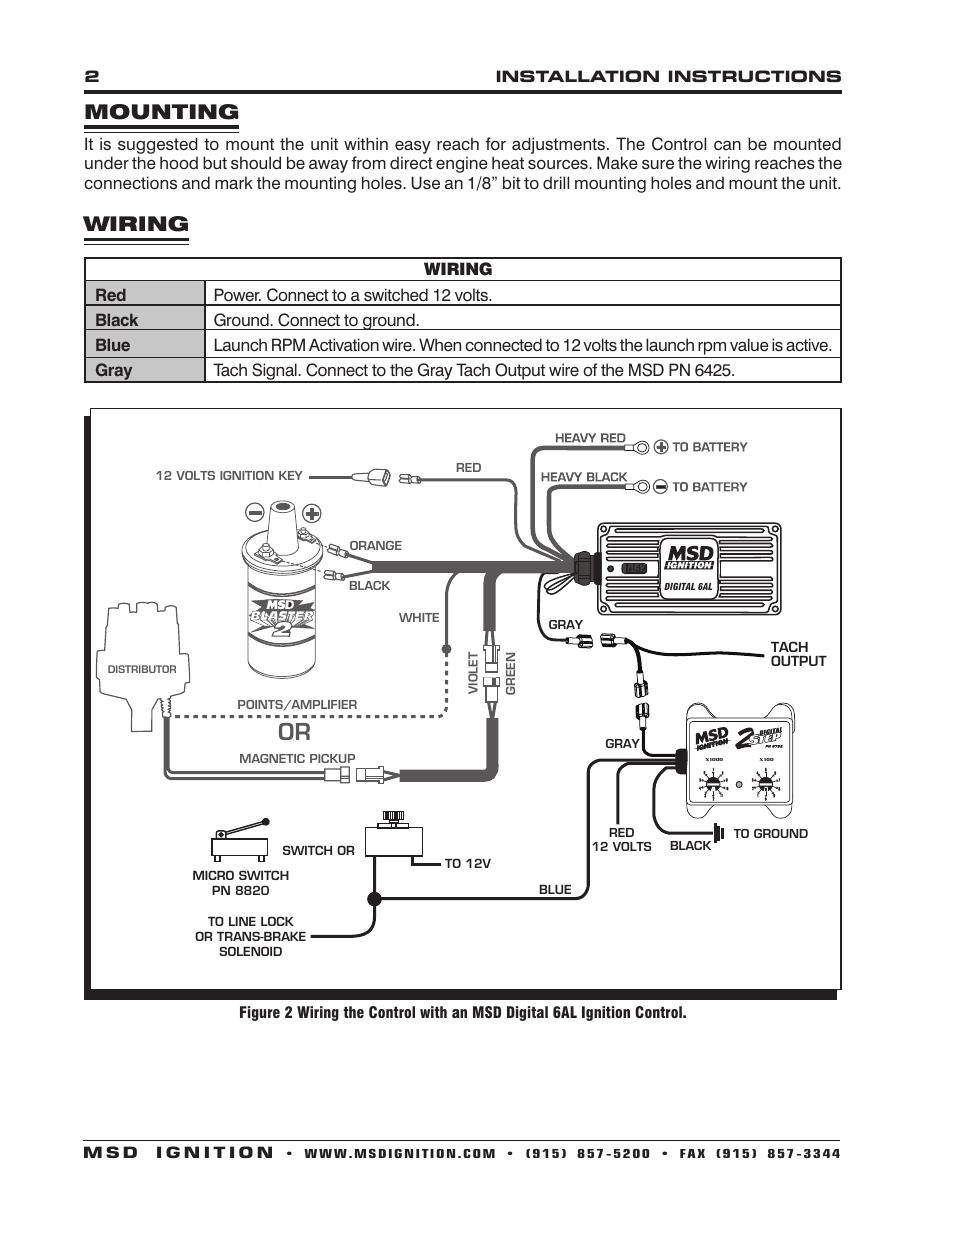 msd 8732 2 step rev control for digital 6al installation page2?resize\\\\=665%2C861 toyota forklift ignition key wiring diagram nissan forklift toyota forklift wiring diagram at alyssarenee.co